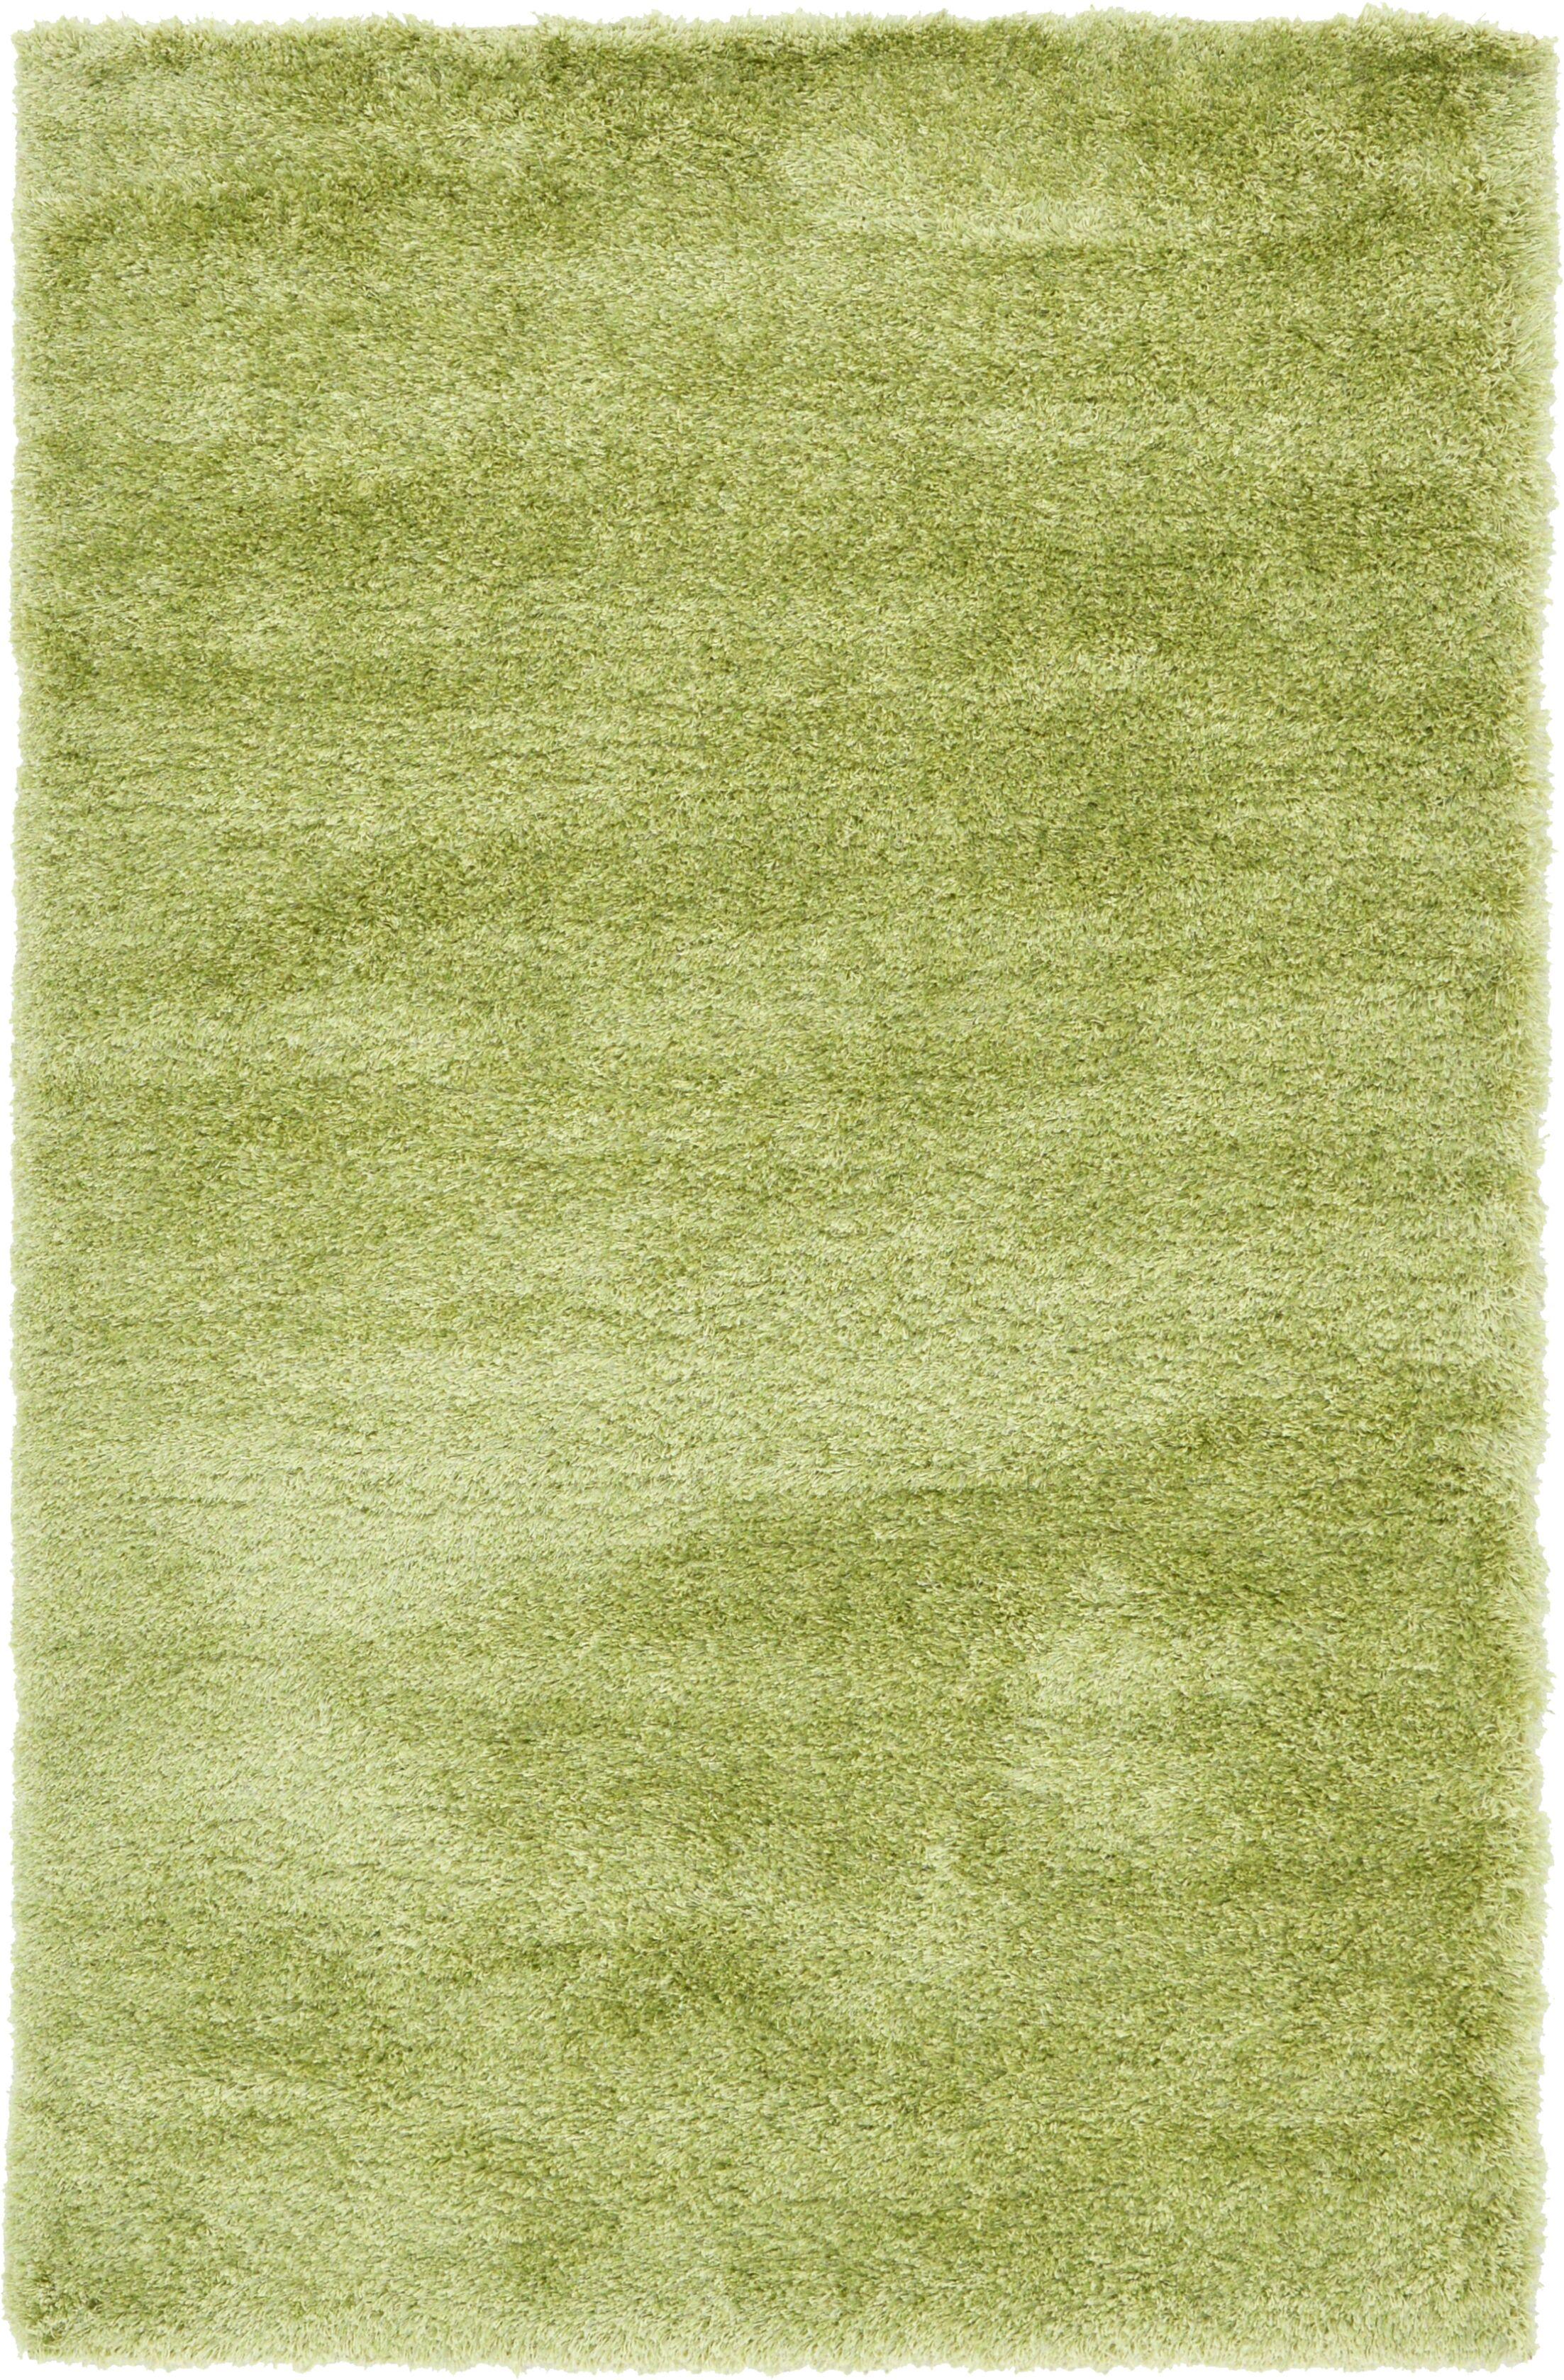 Evelyn Cedar Green Area Rug Rug Size: Rectangle 5' x 8'